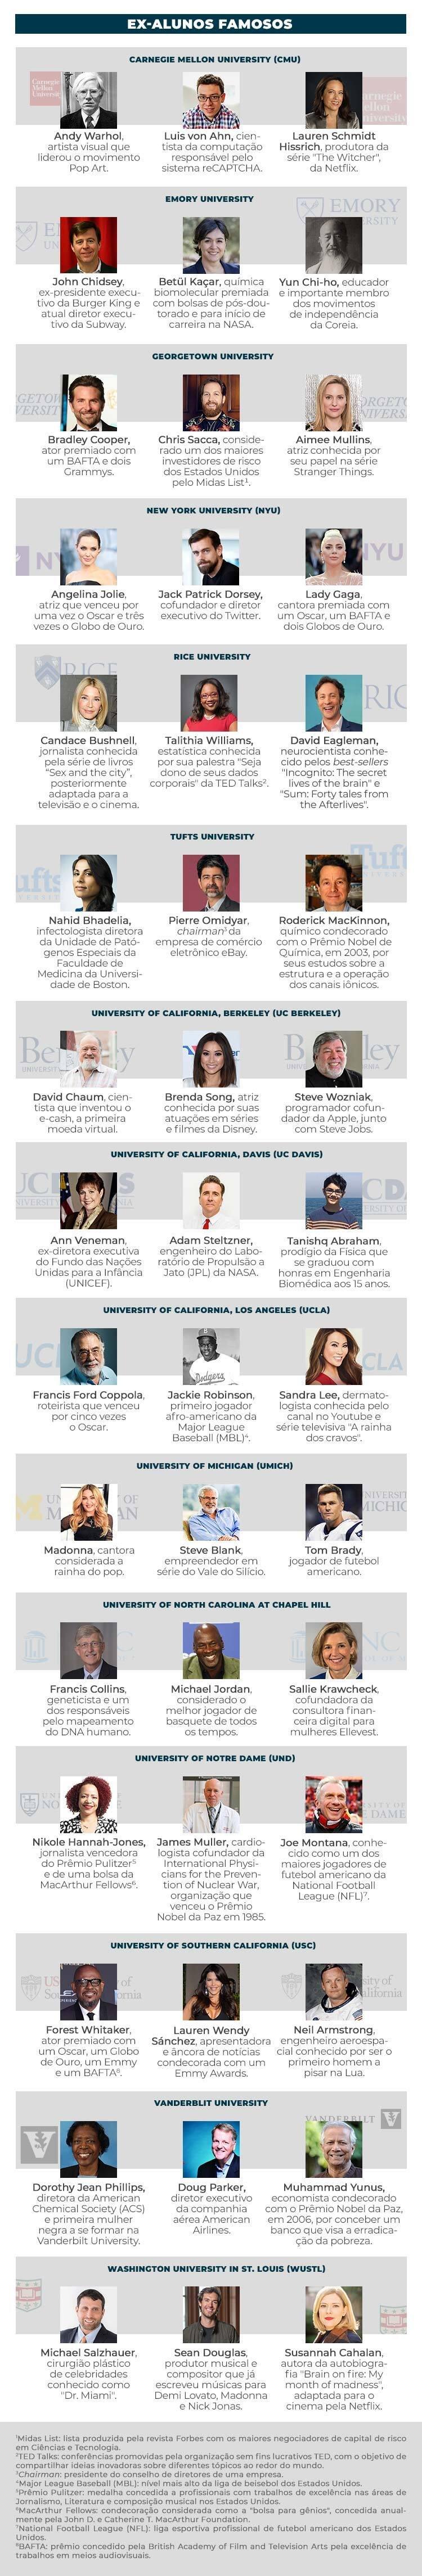 Ex-alunos famosos de universidades americanas